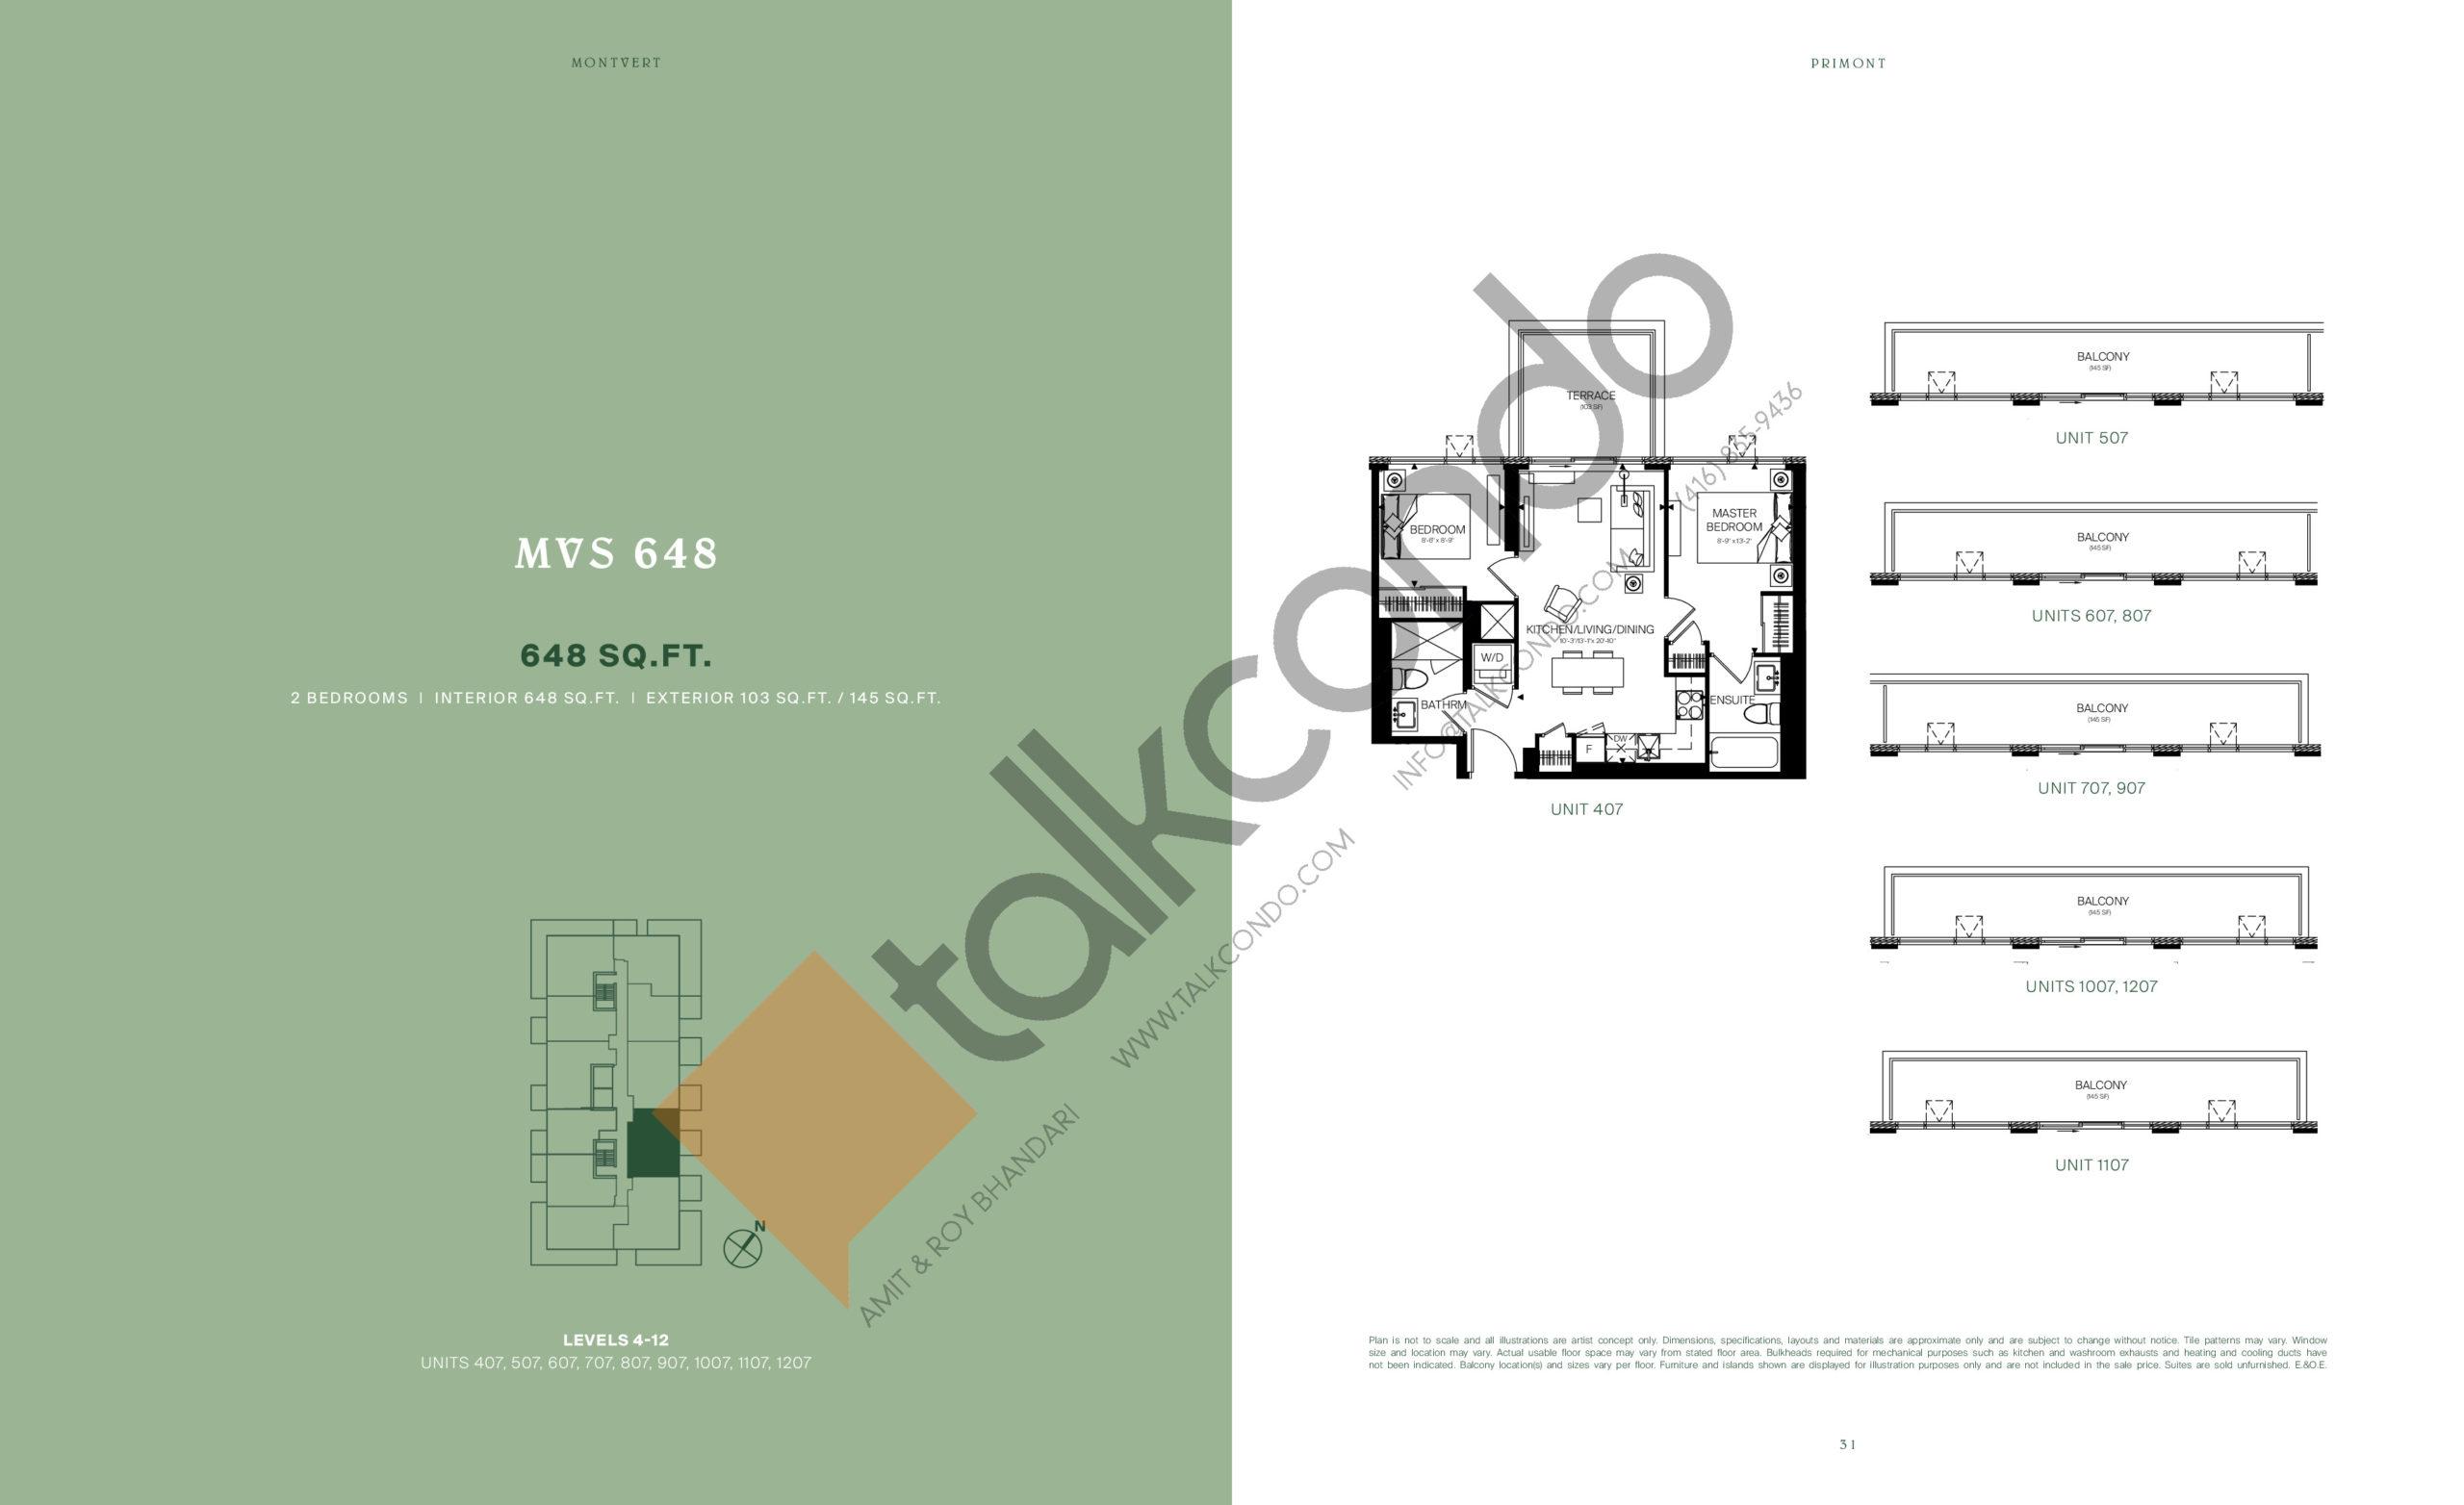 MVS 648 Floor Plan at MontVert Condos - 648 sq.ft